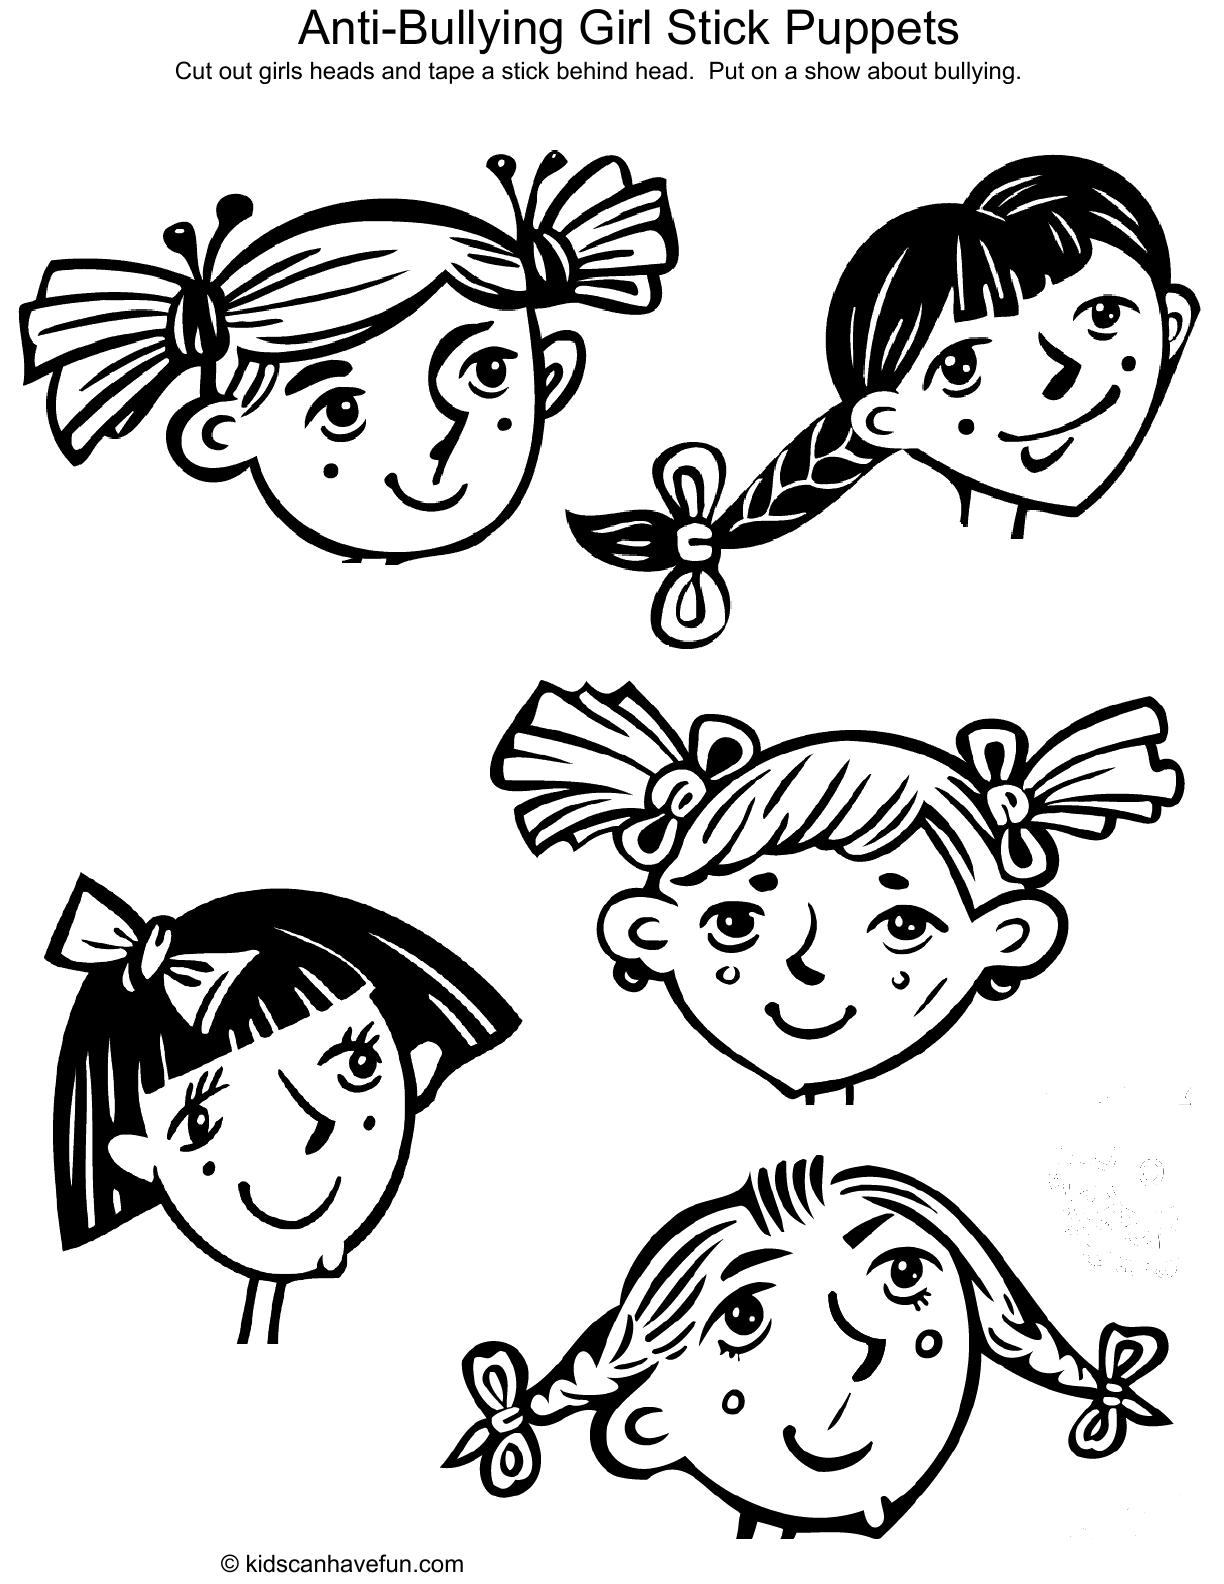 Anti Bullying Girl Stick Puppets